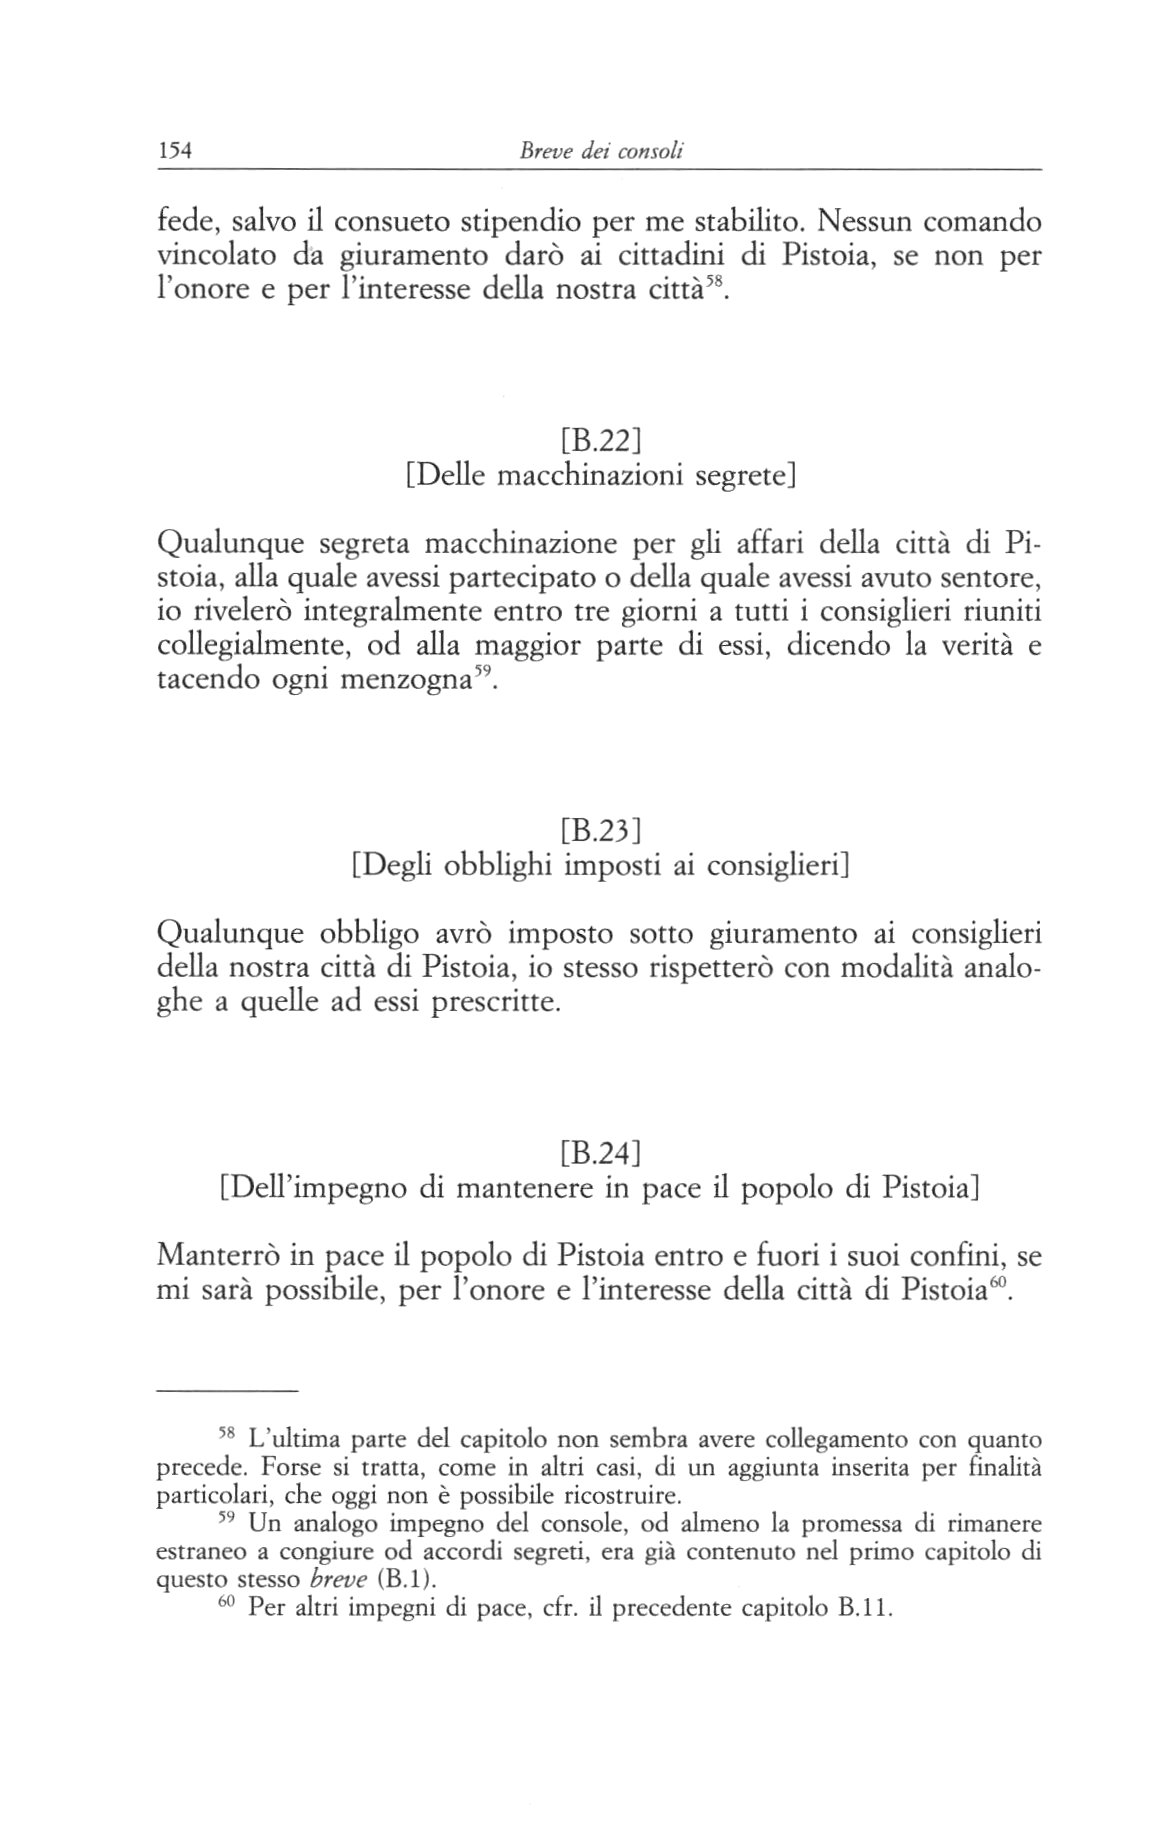 statuti pistoiesi del sec.XII 0154.jpg